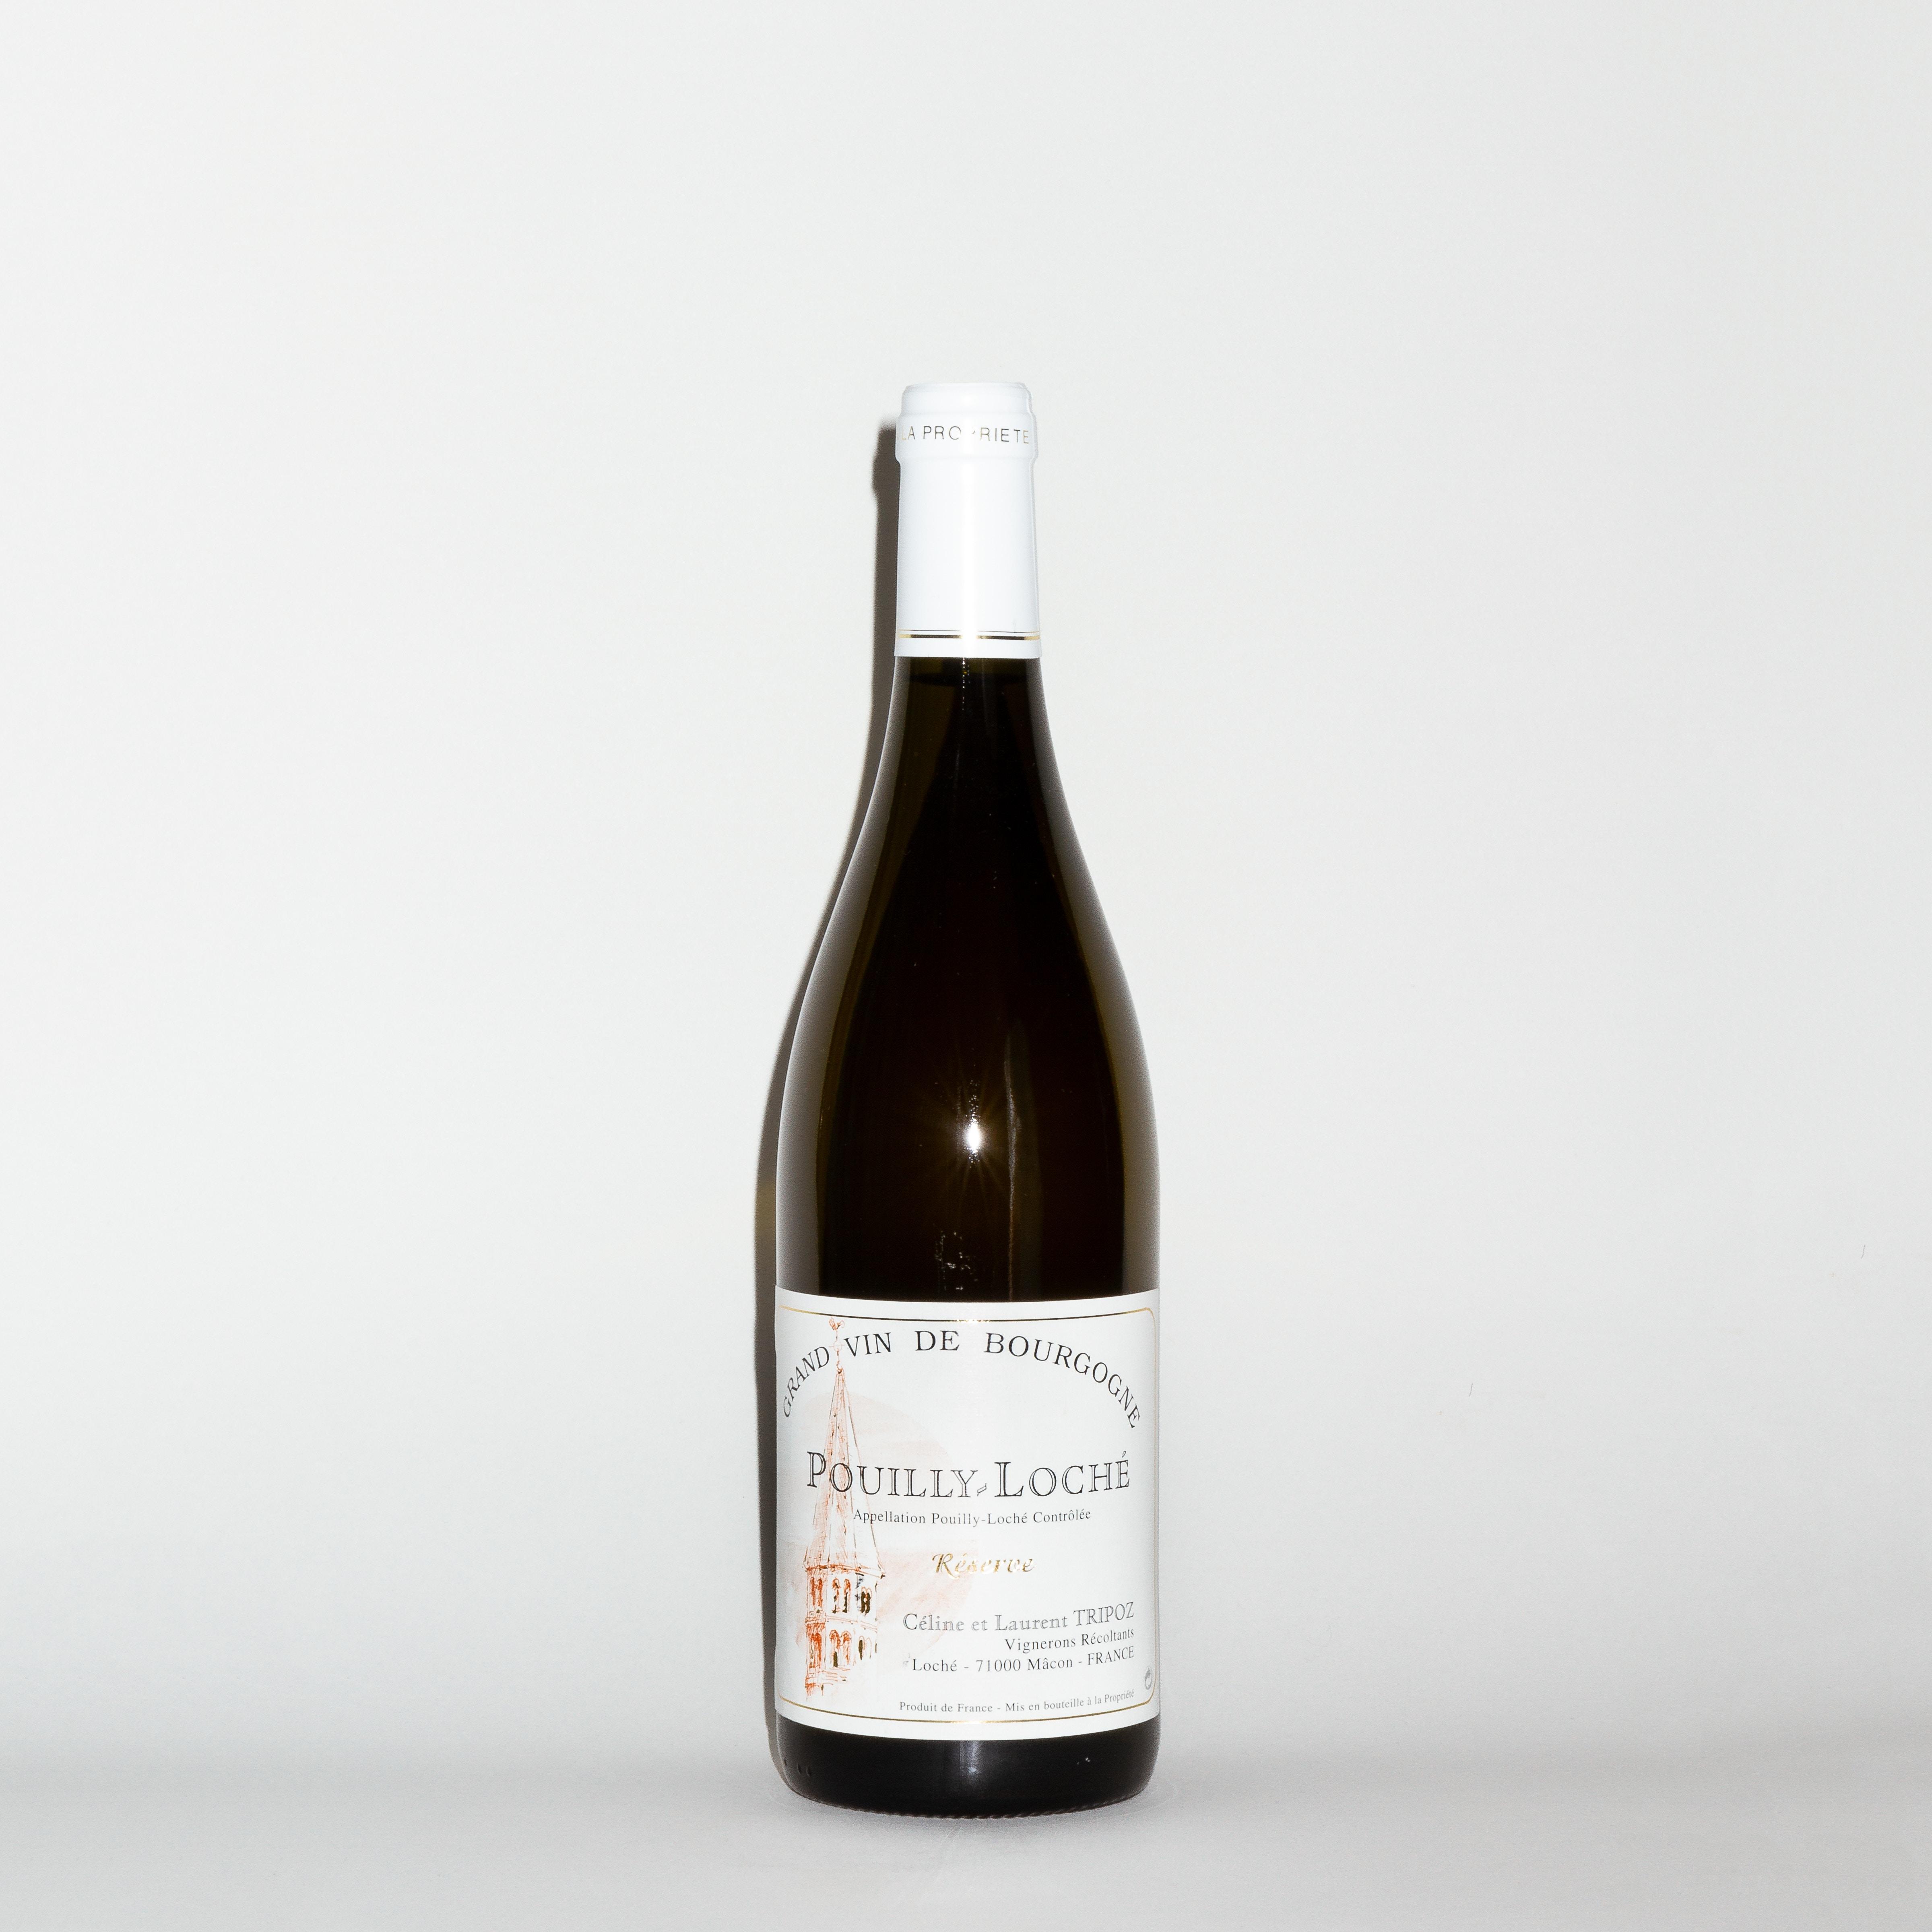 Pouilly-Loché 2009 by Celine & Laurent Tripoz